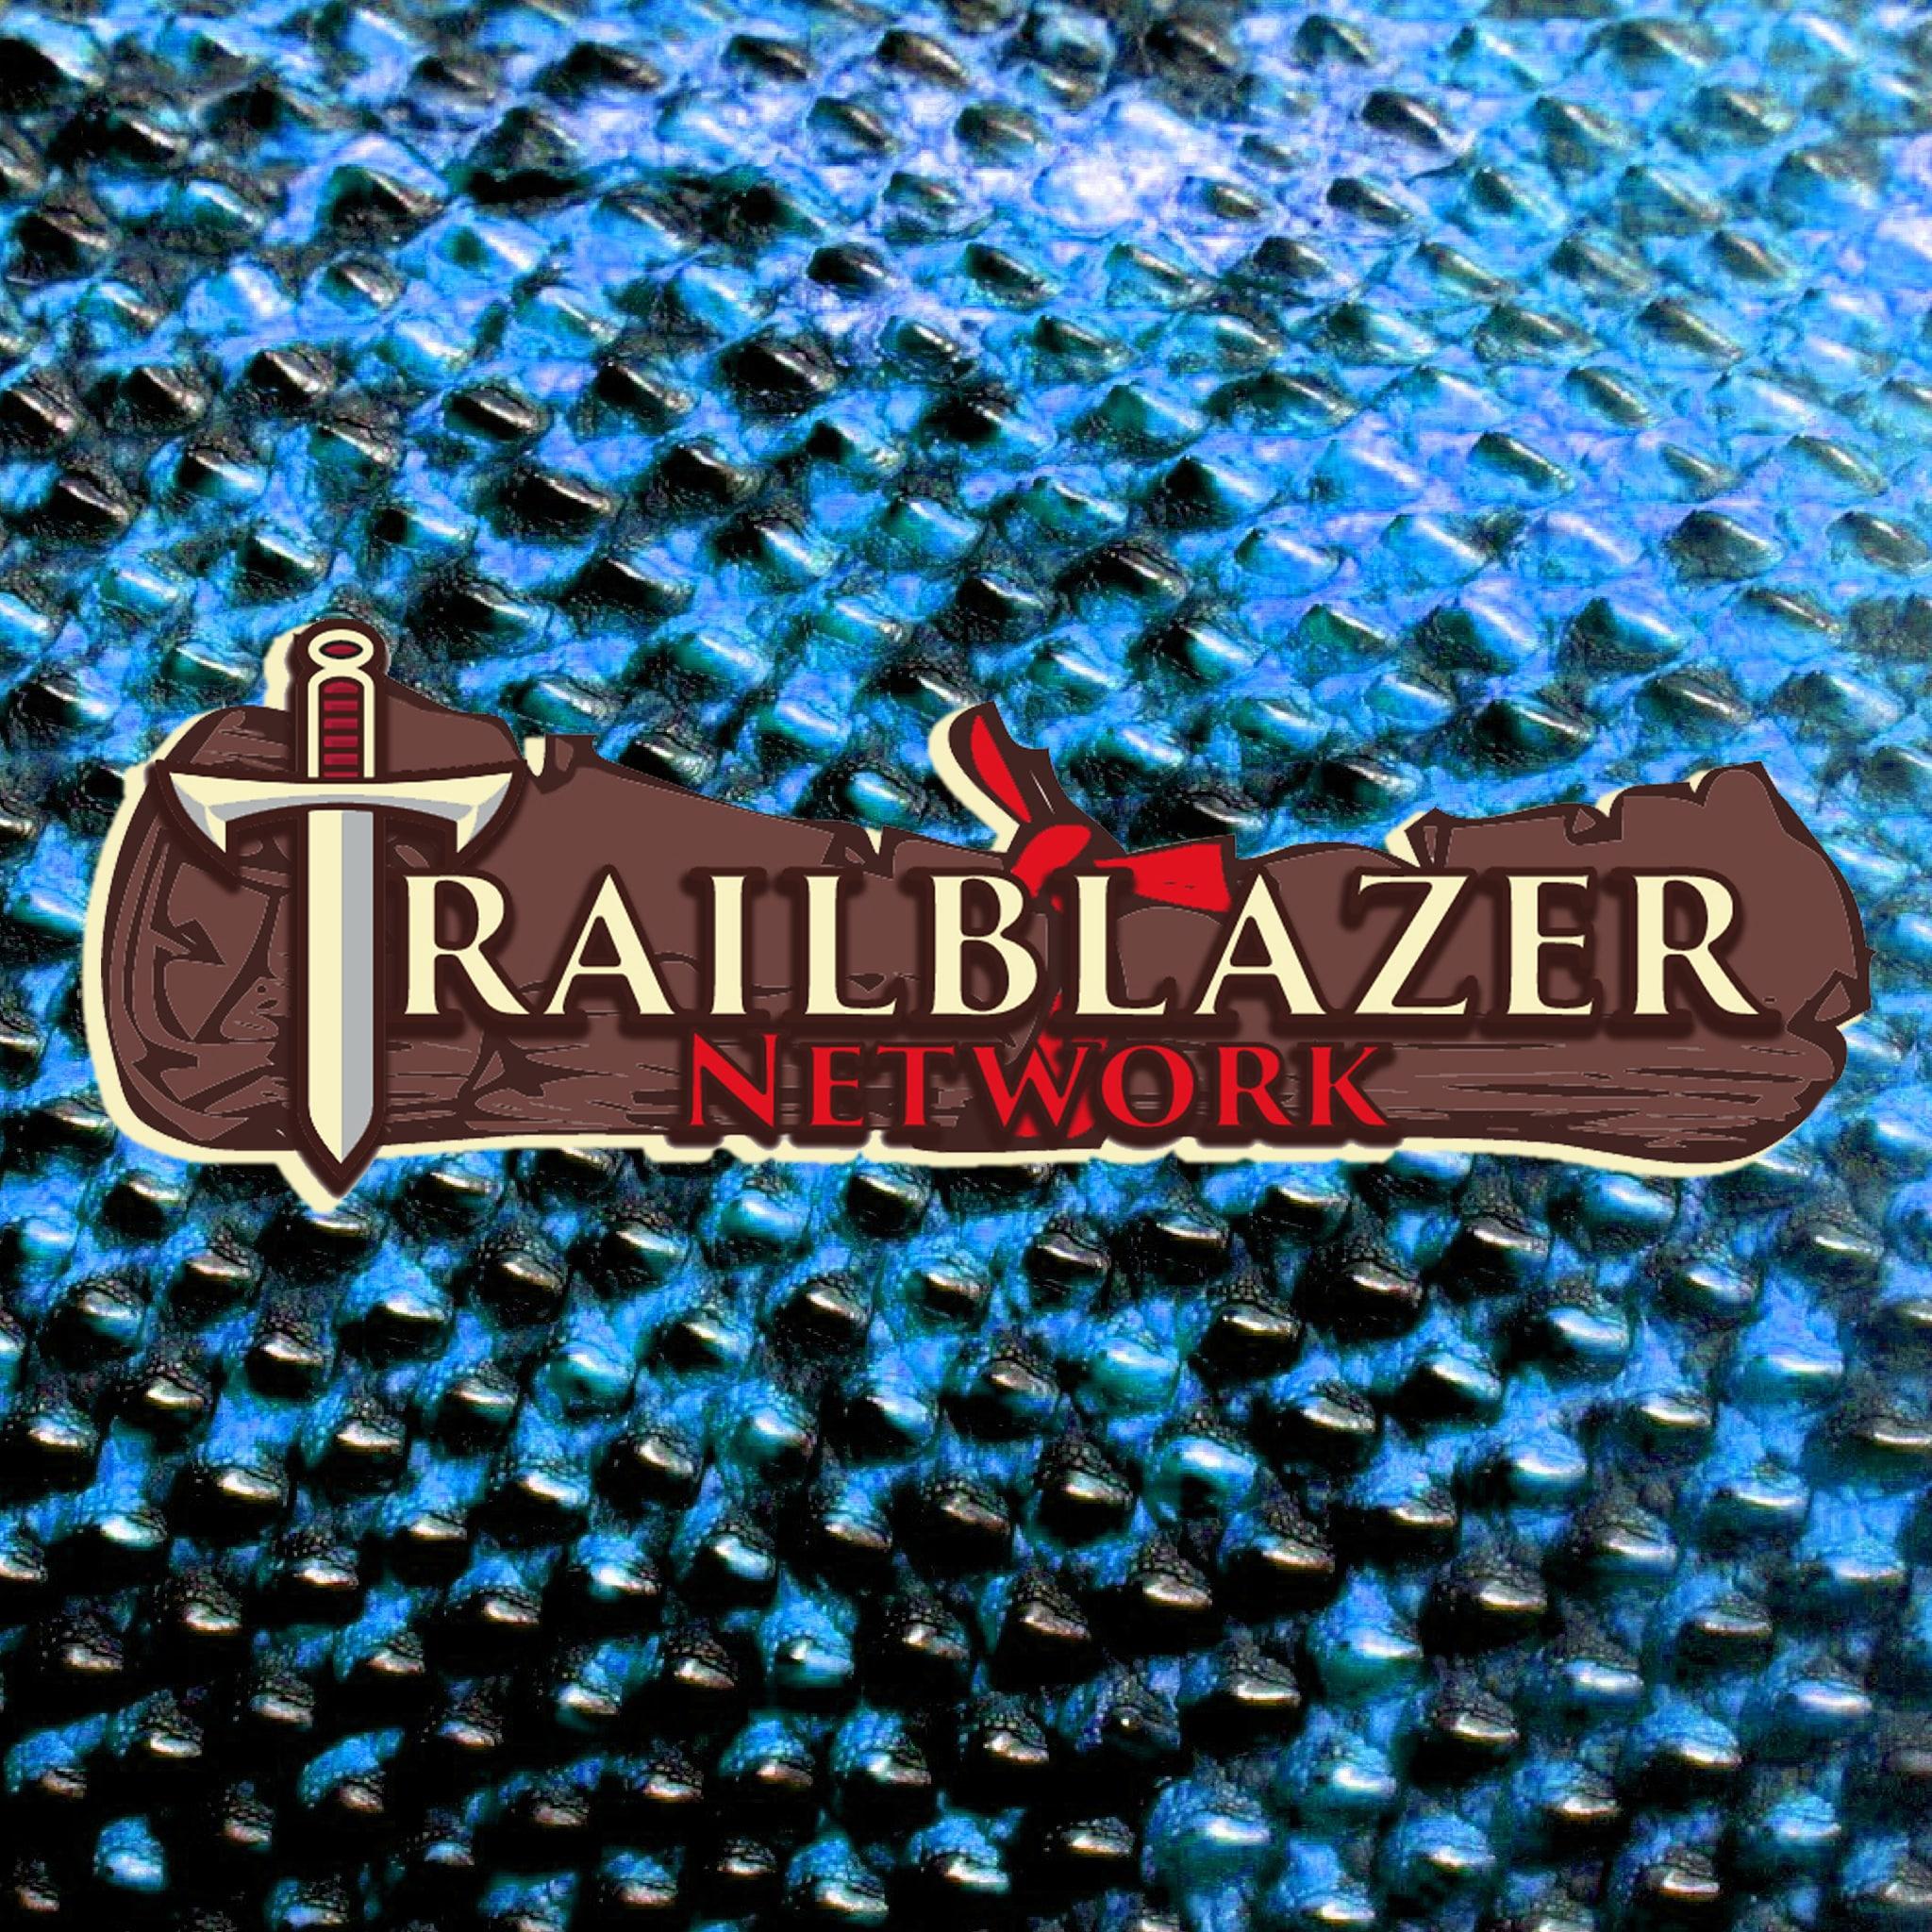 Trailblazer Network